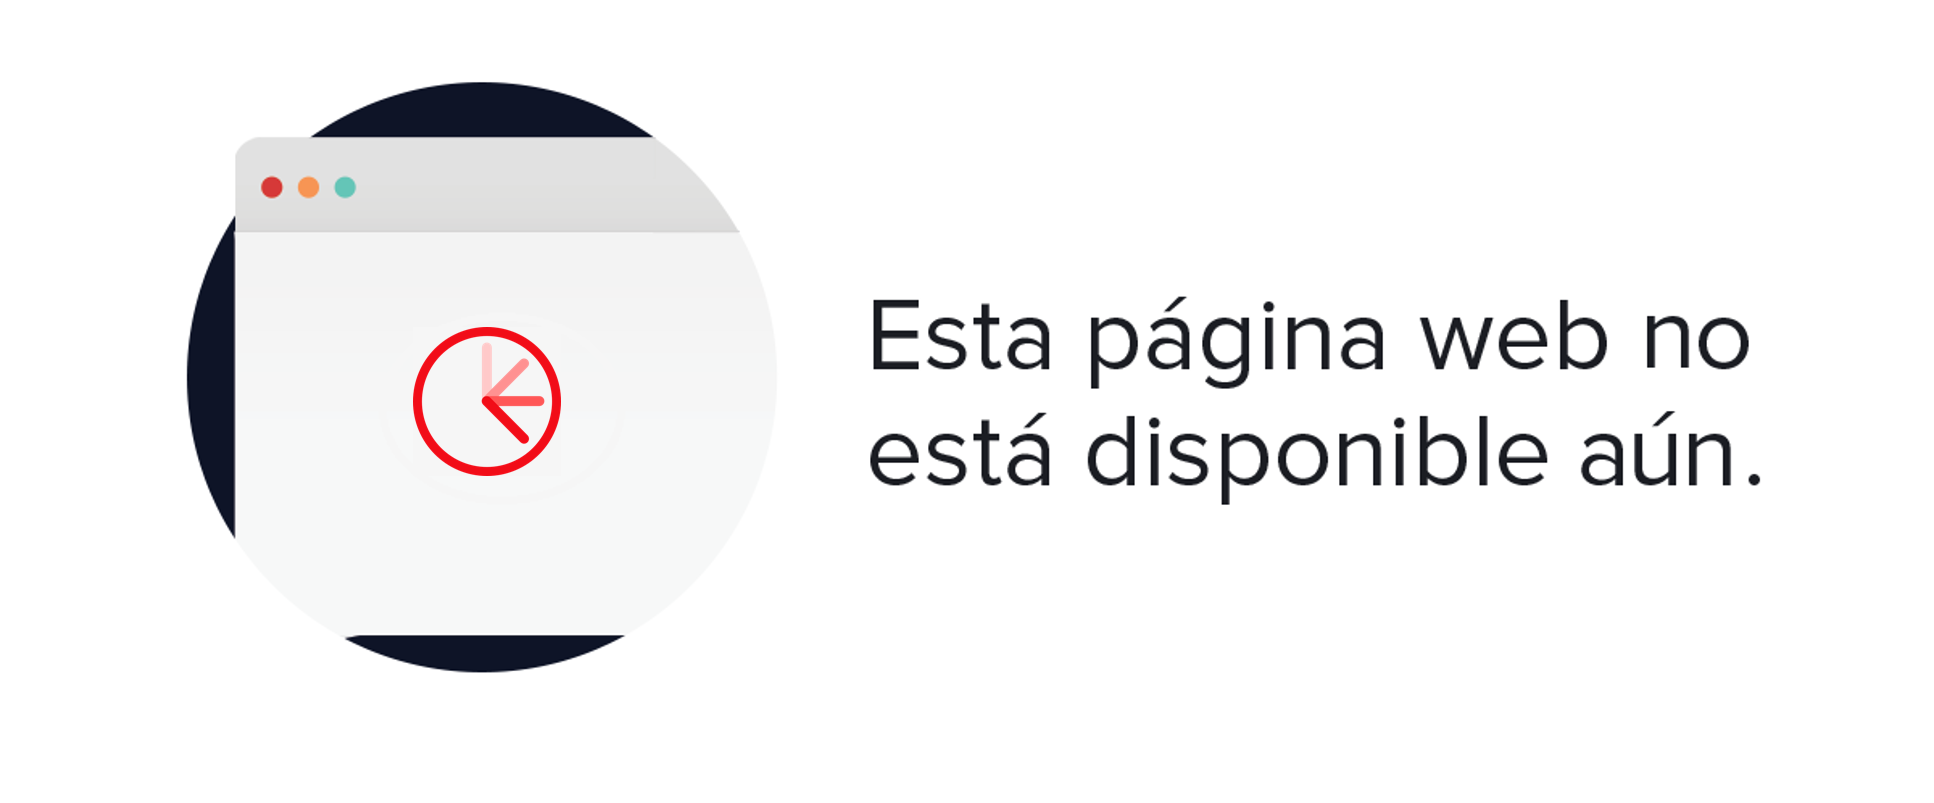 Yerse - Chaqueta de mujer Yerse de algodón blanco Blanco 8431267501023 - NMCBNOD